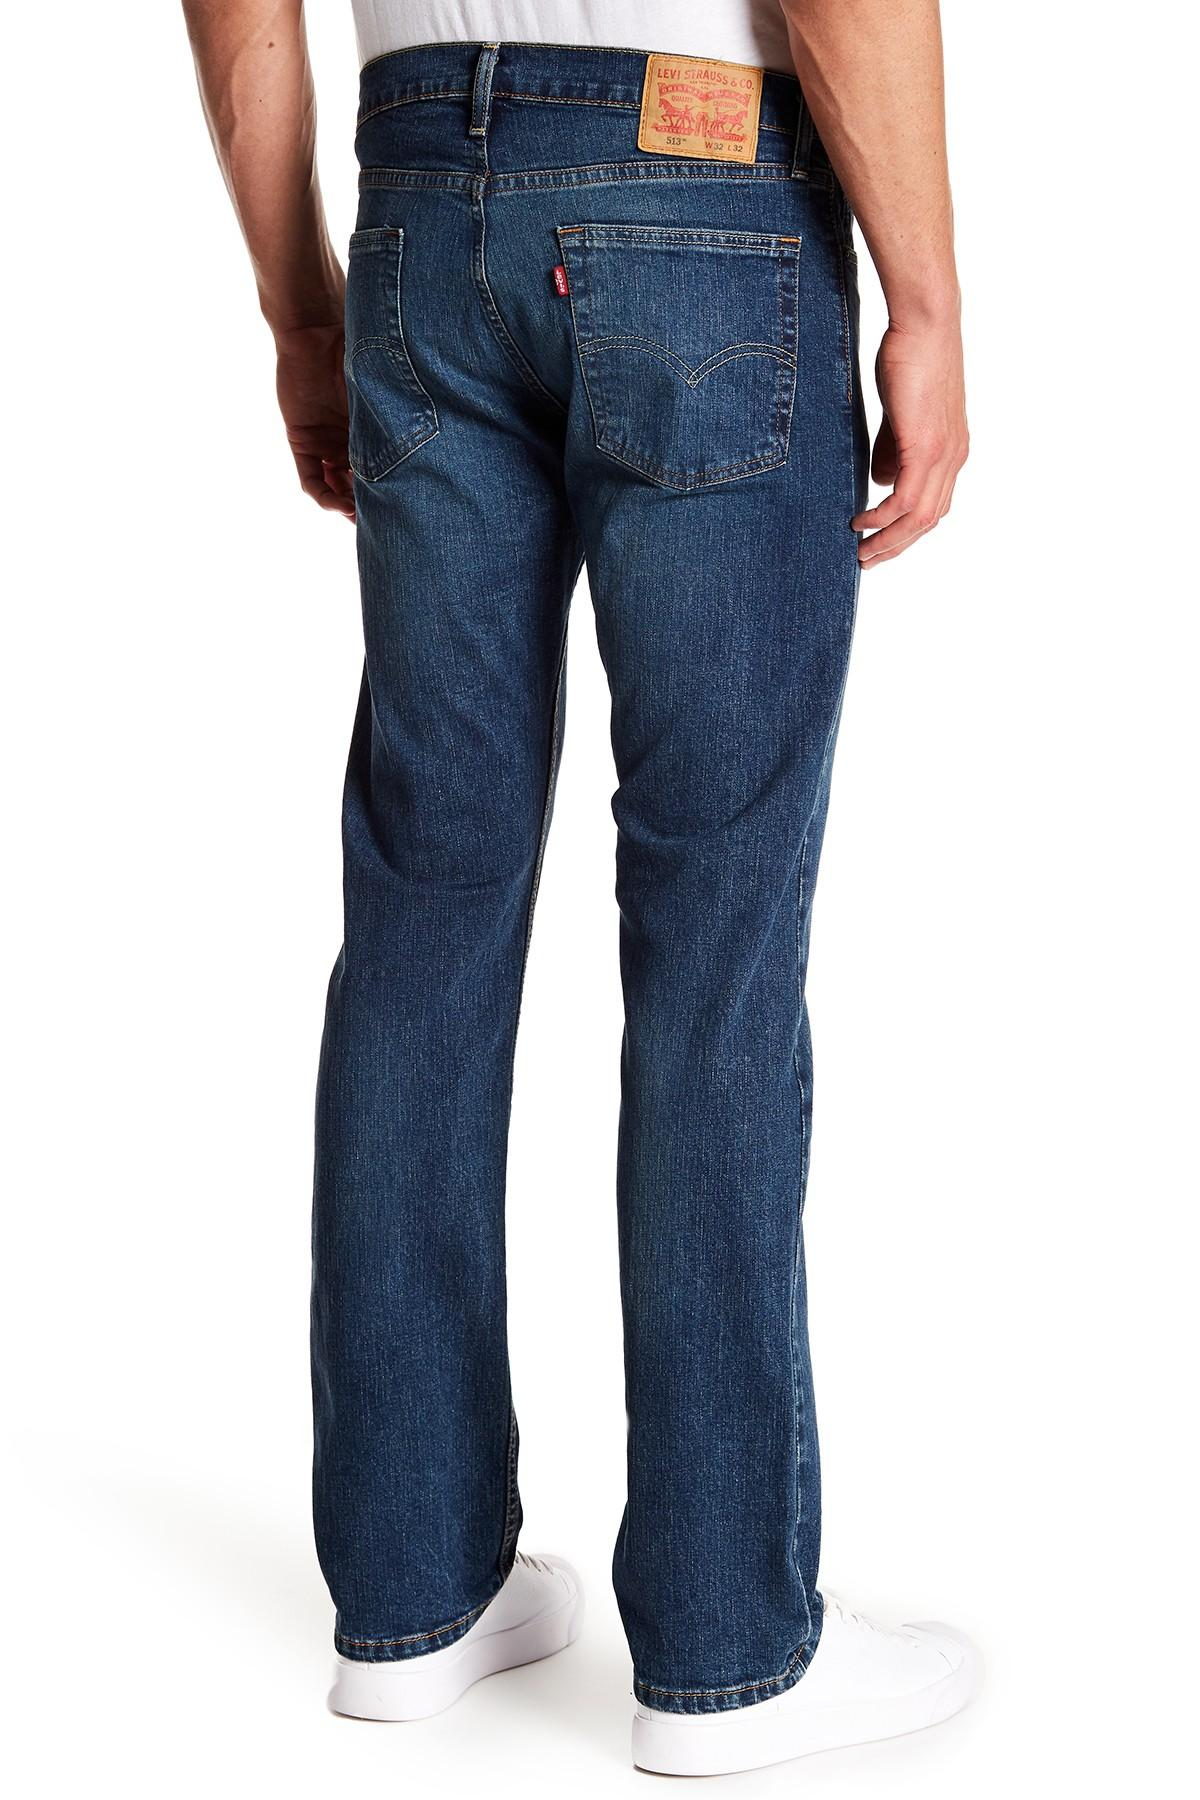 02b0c53b Levi's 513 Vines Slim Straight Fit Jeans - 30-34